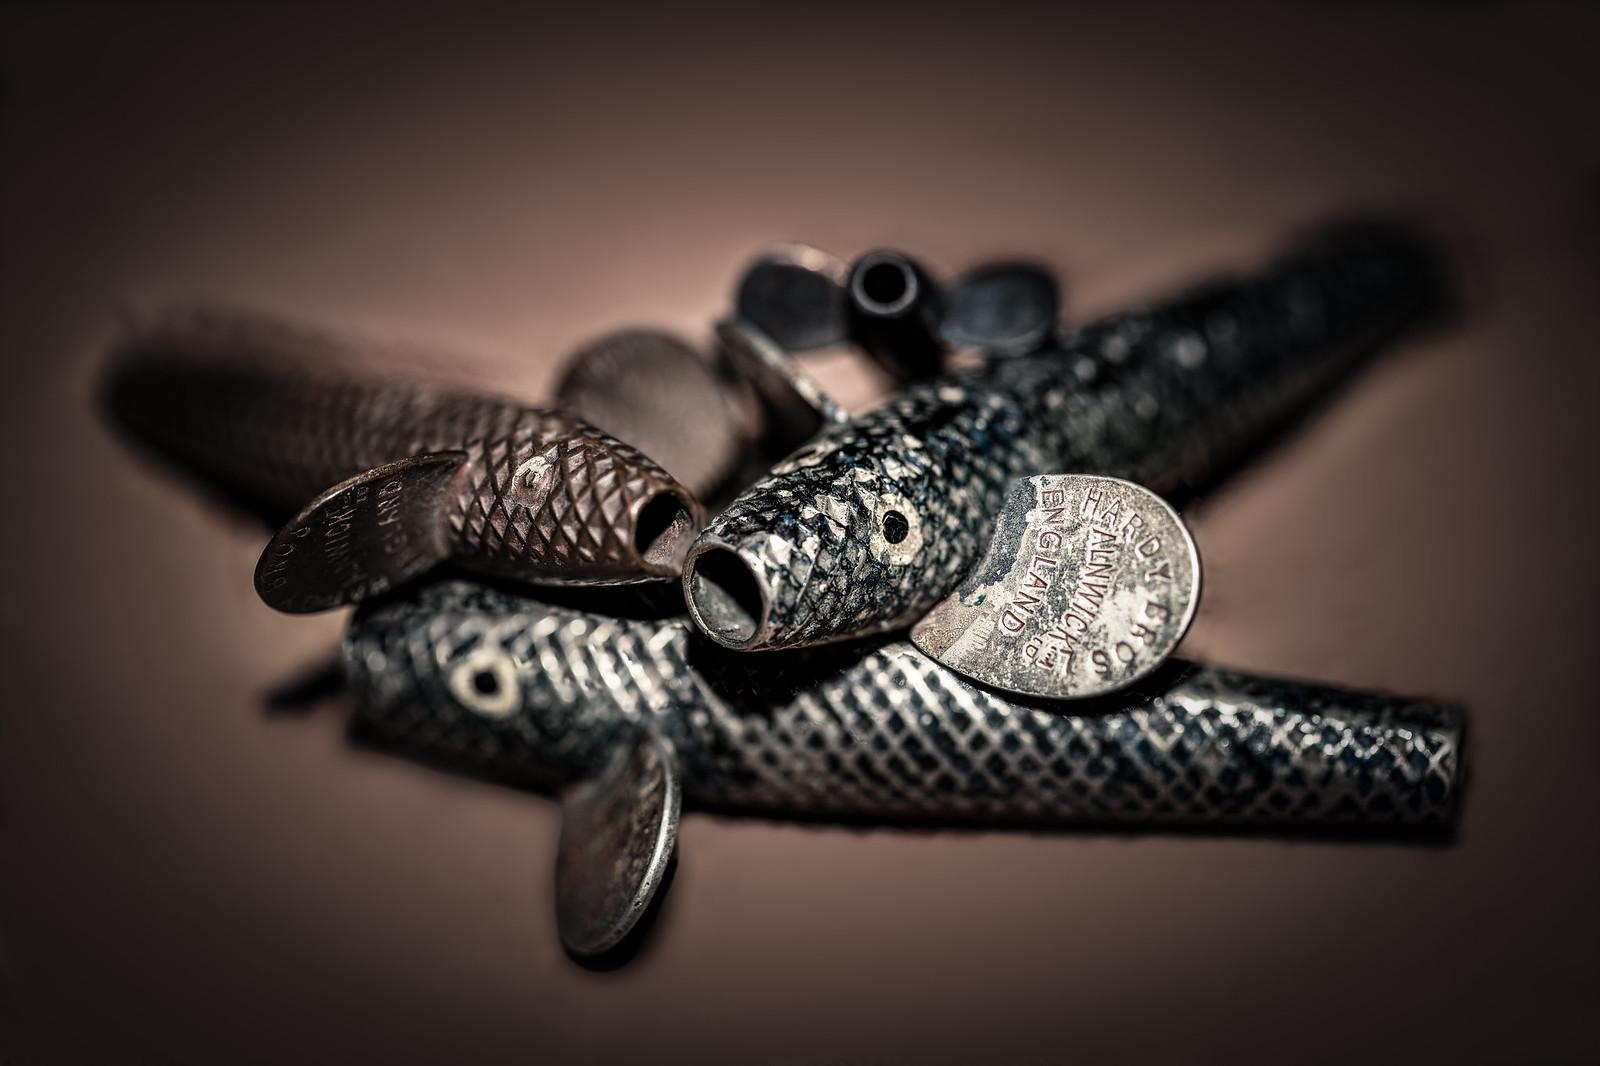 Hardy Devon fishing lure